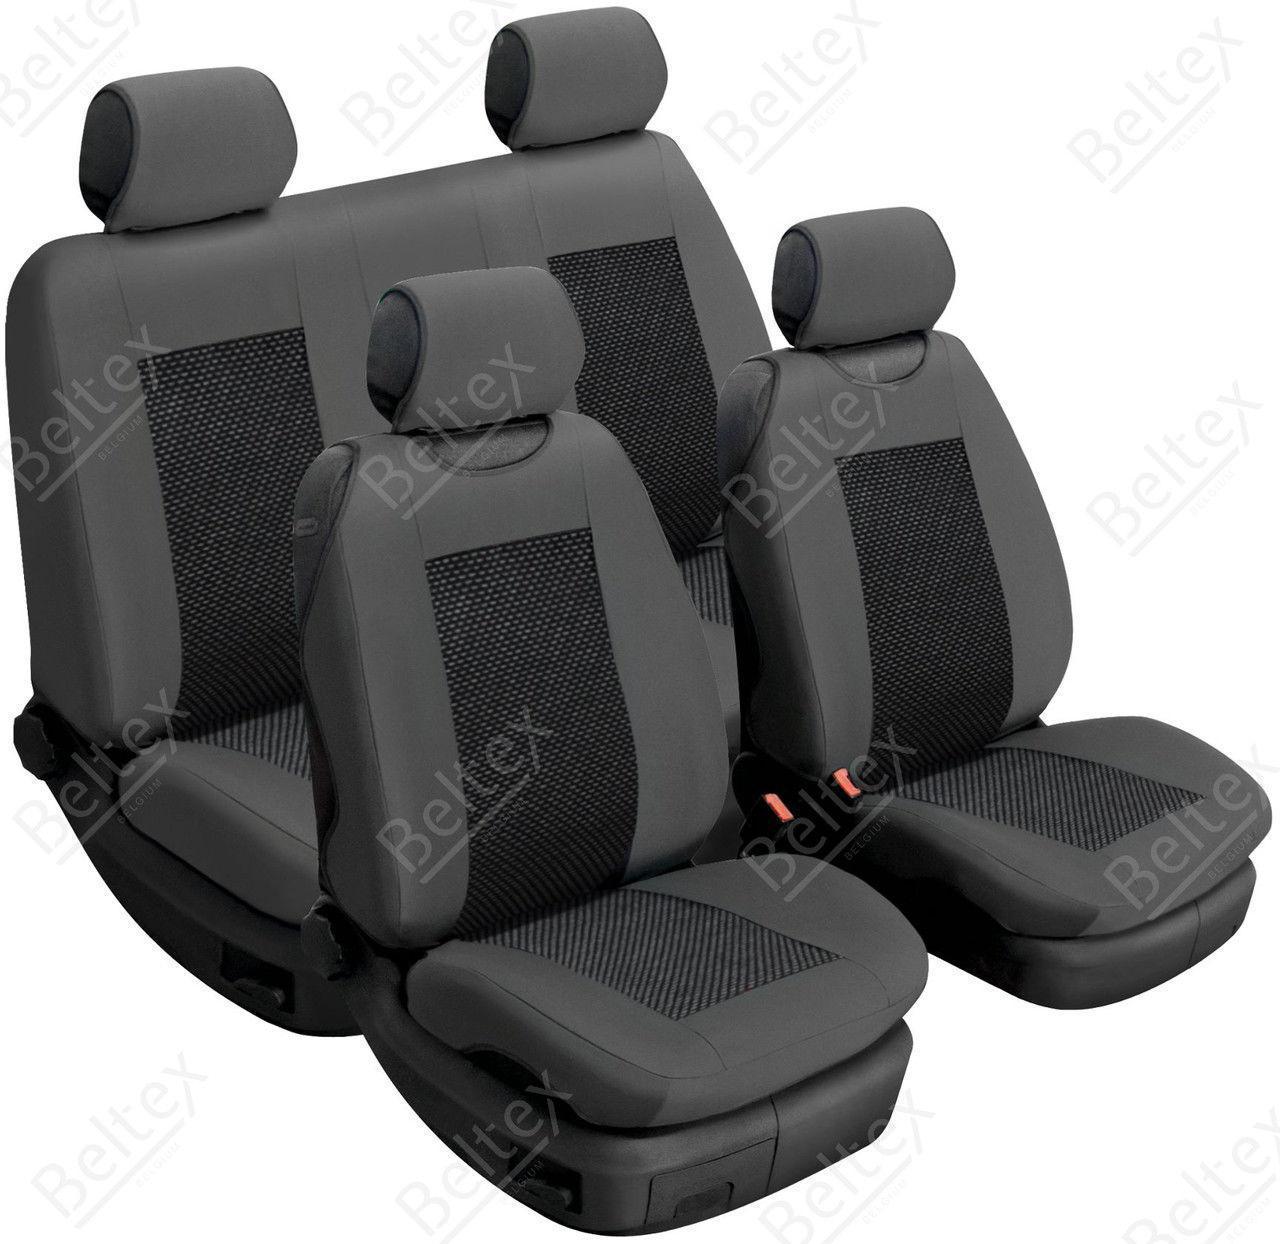 Майки/чехлы на сиденья Сеат Леон 3 (Seat Leon III)